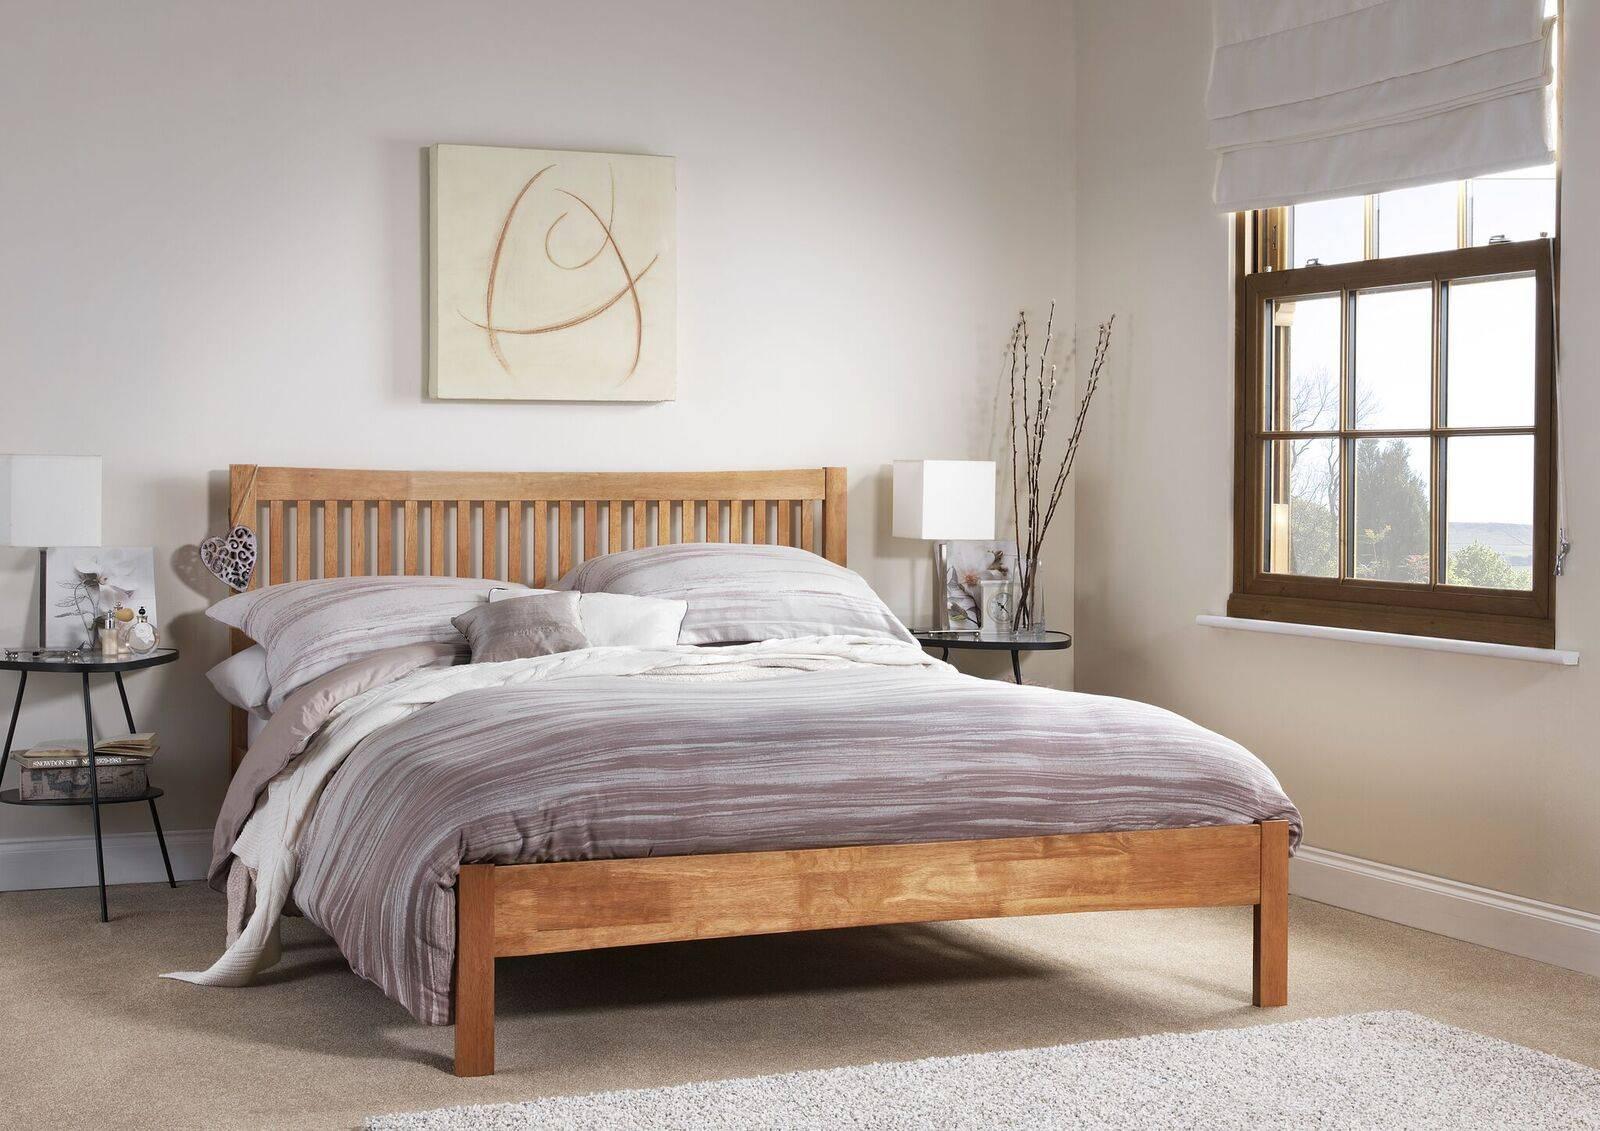 Coytes Bed Sofa Shop Burton On Trent